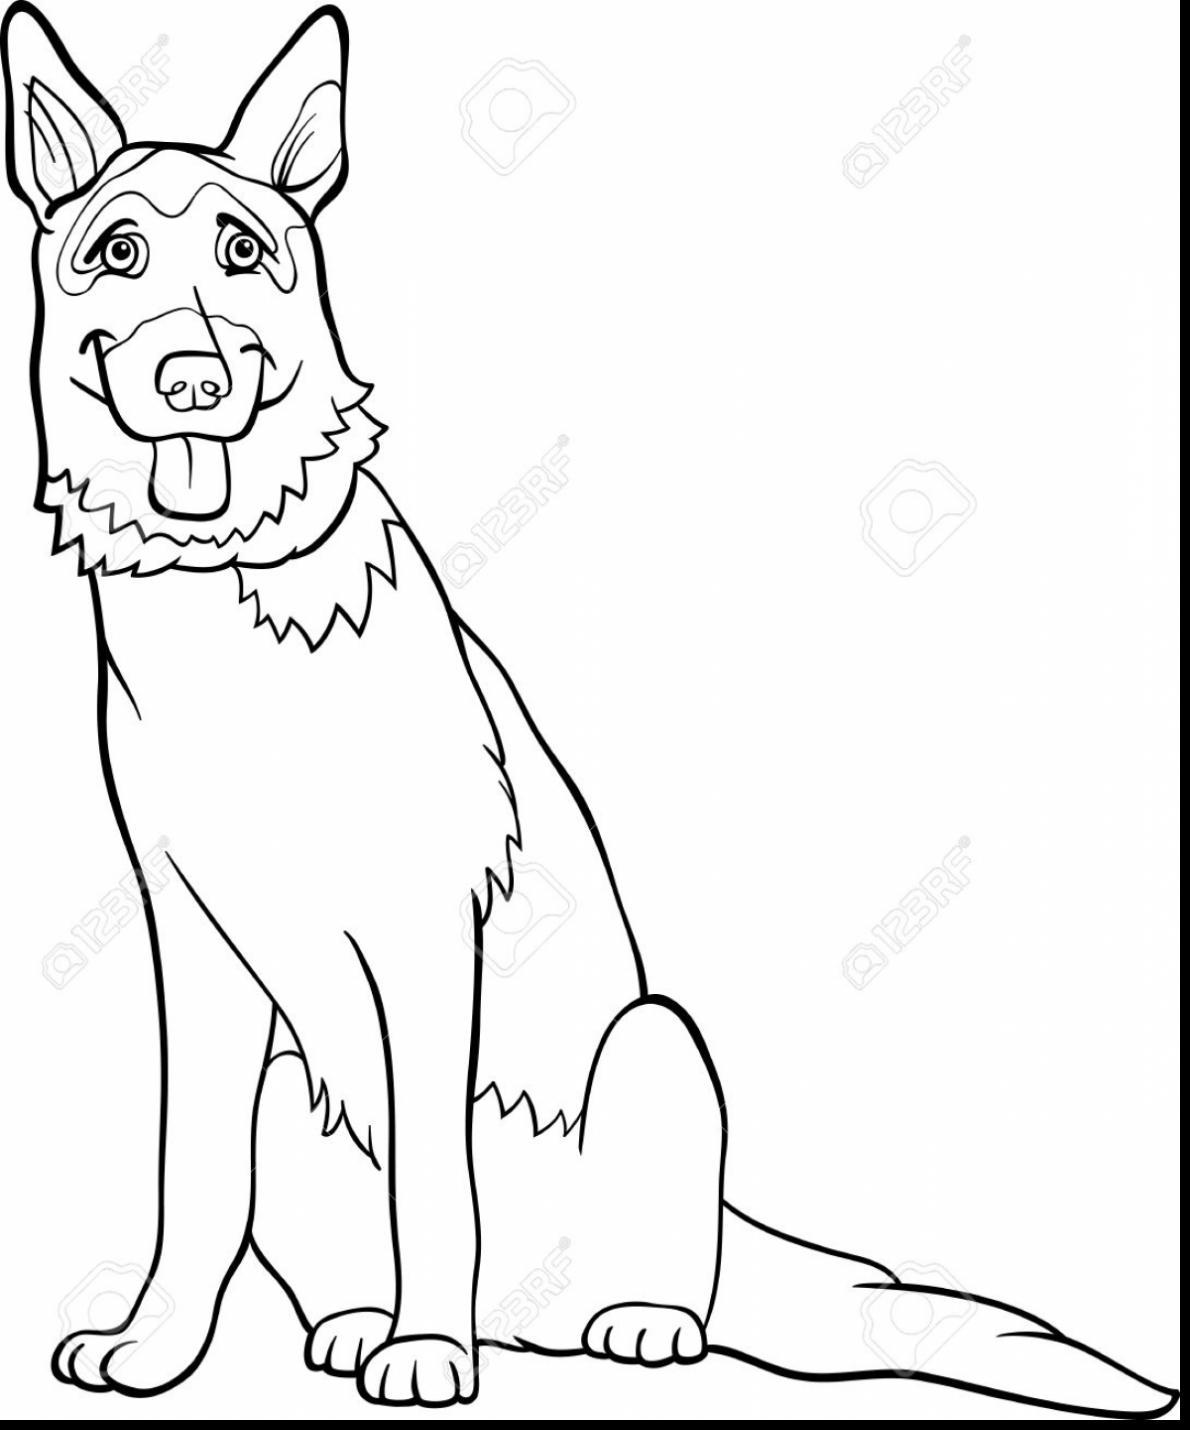 1190x1430 Terrific German Shepherd Coloring Pages Free O